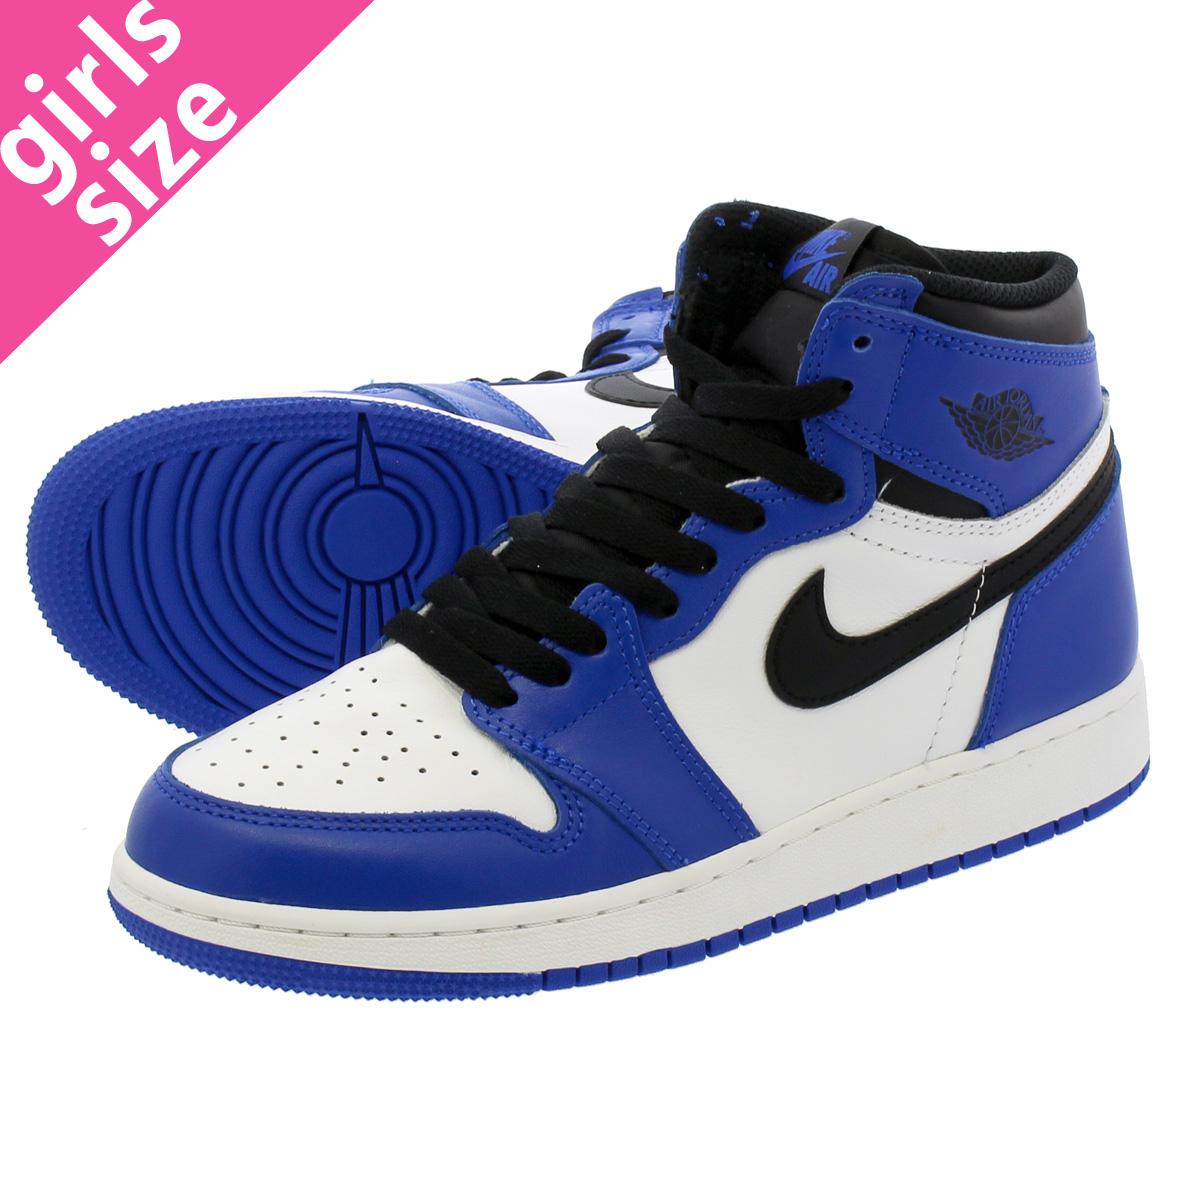 lowest price 60fb4 c07ce NIKE AIR JORDAN 1 RETRO HIGH OG BG Nike Air Jordan 1 nostalgic high OG BG  GAME ROYAL SUMMIT WHITE BLACK